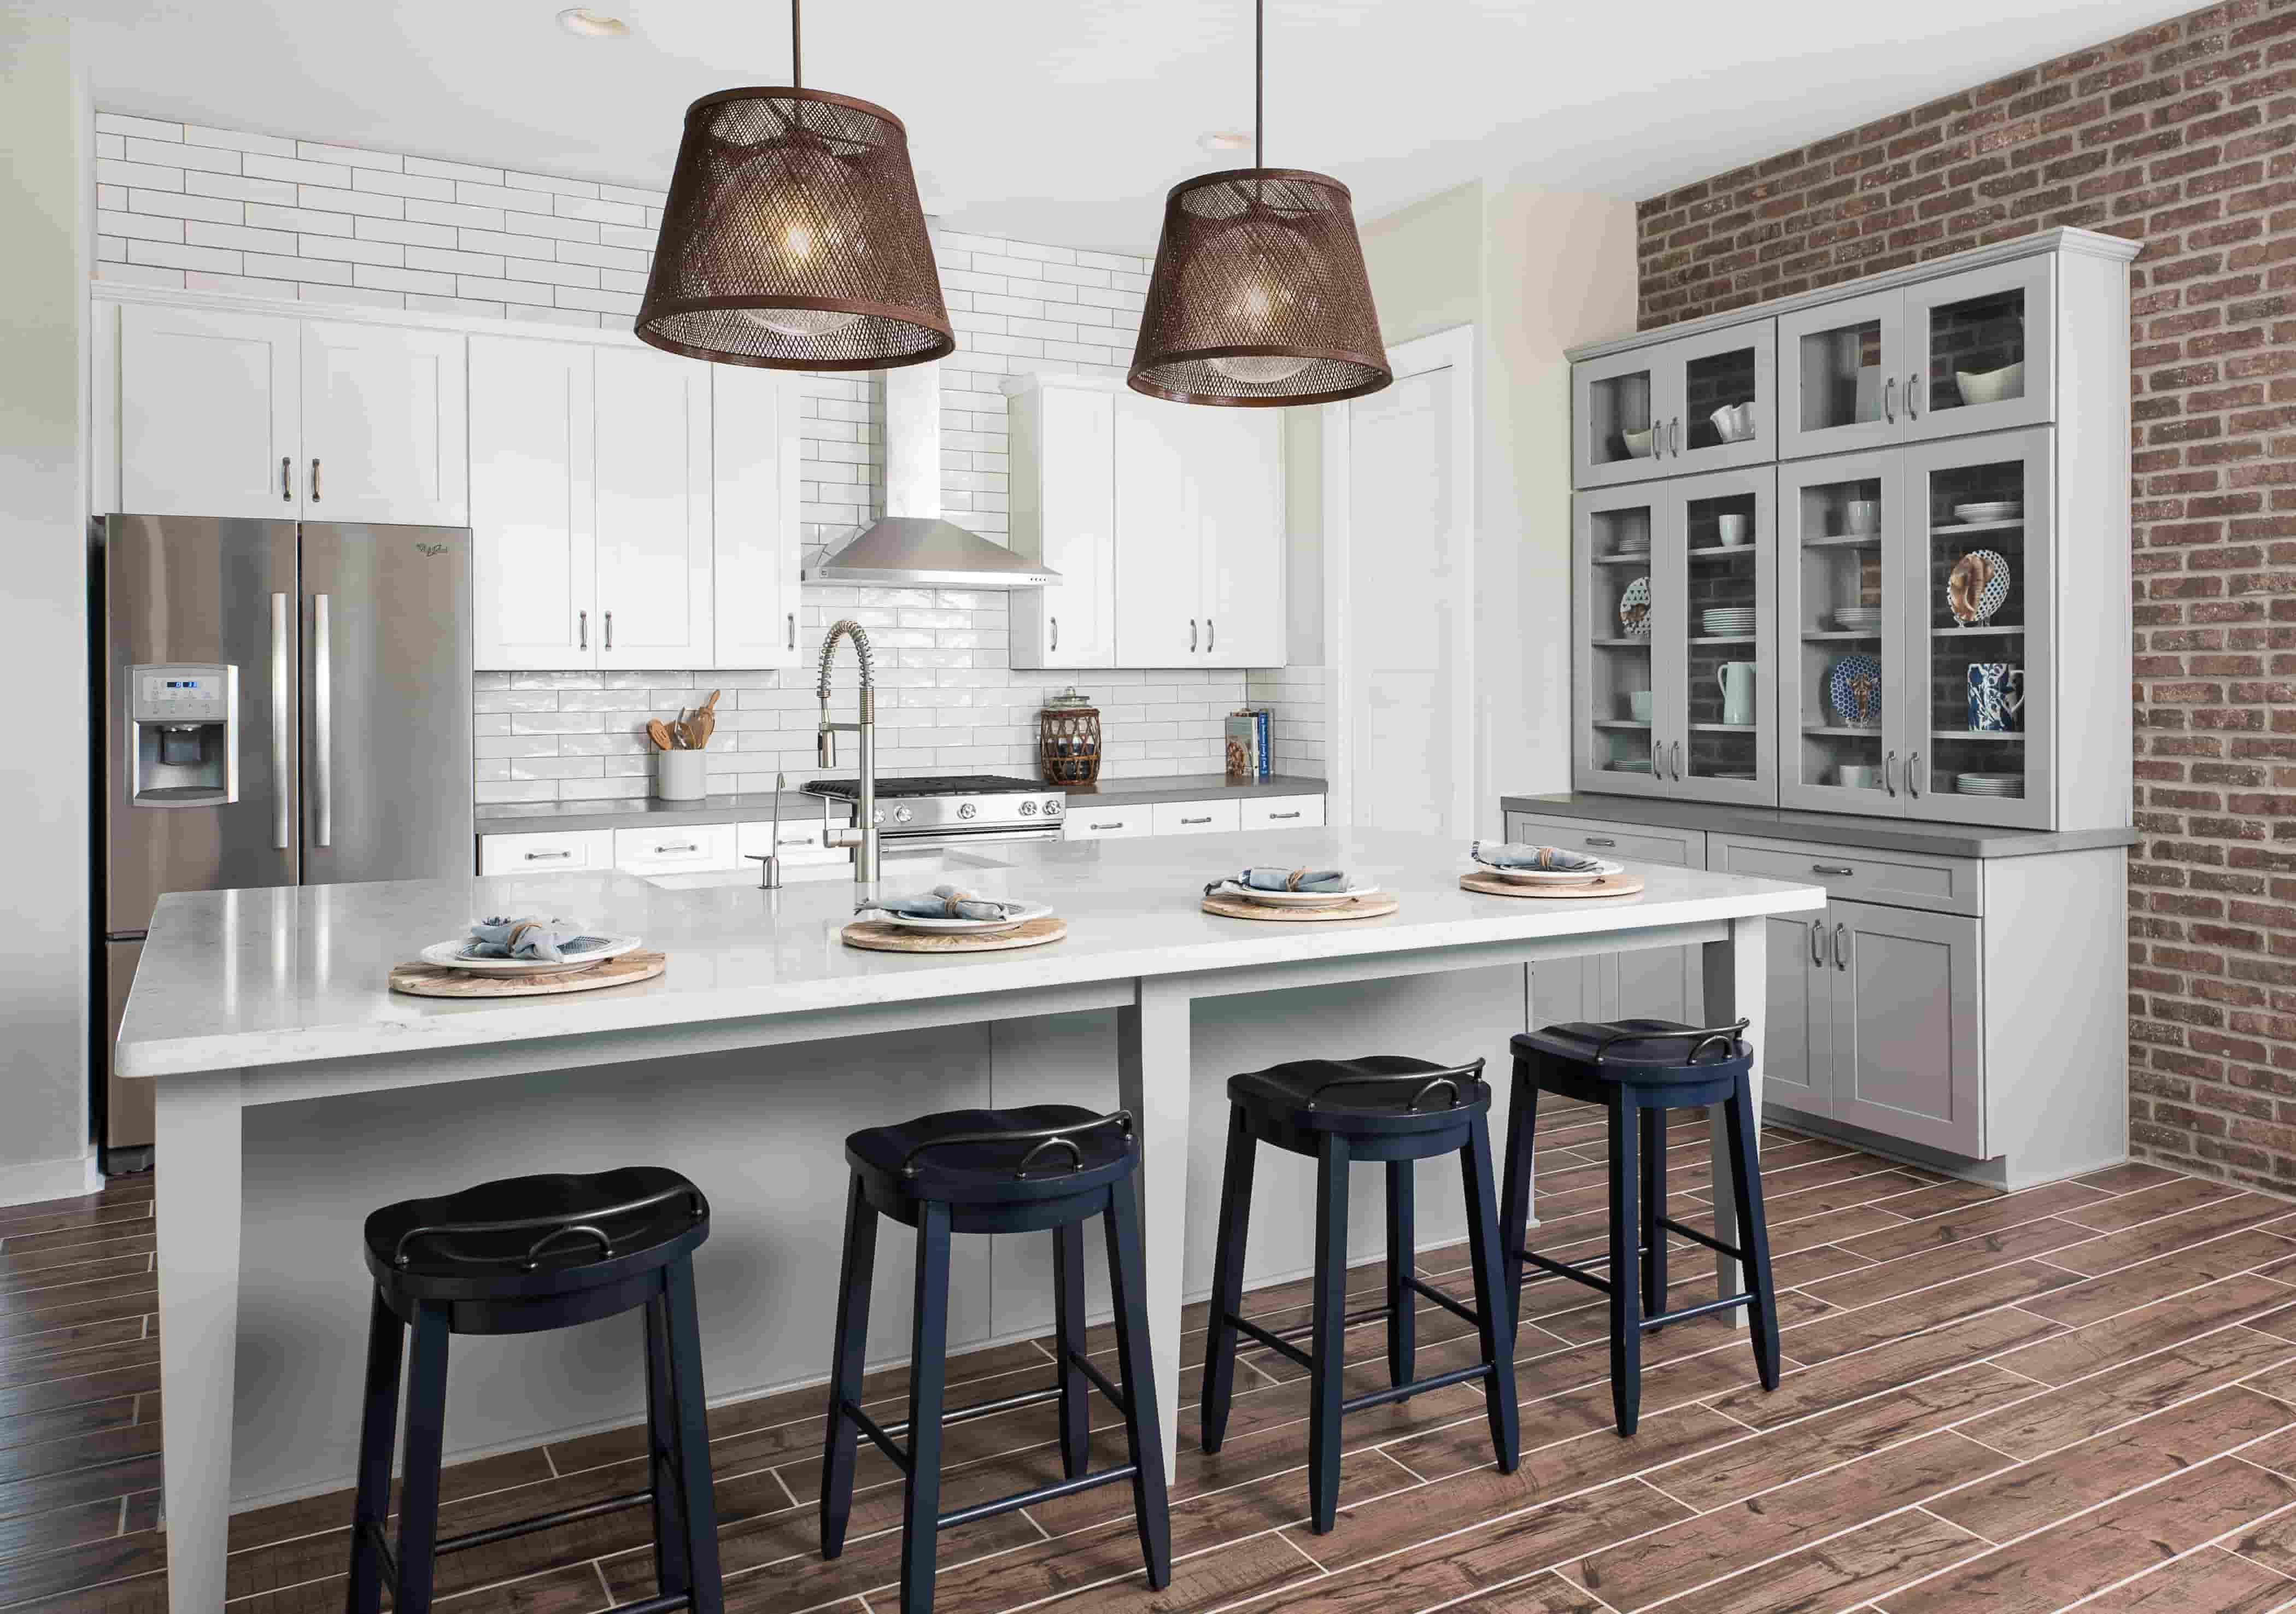 Arcadia Ridge by Ashton Woods Homes - J.P. Cook - Arizona Real Estate